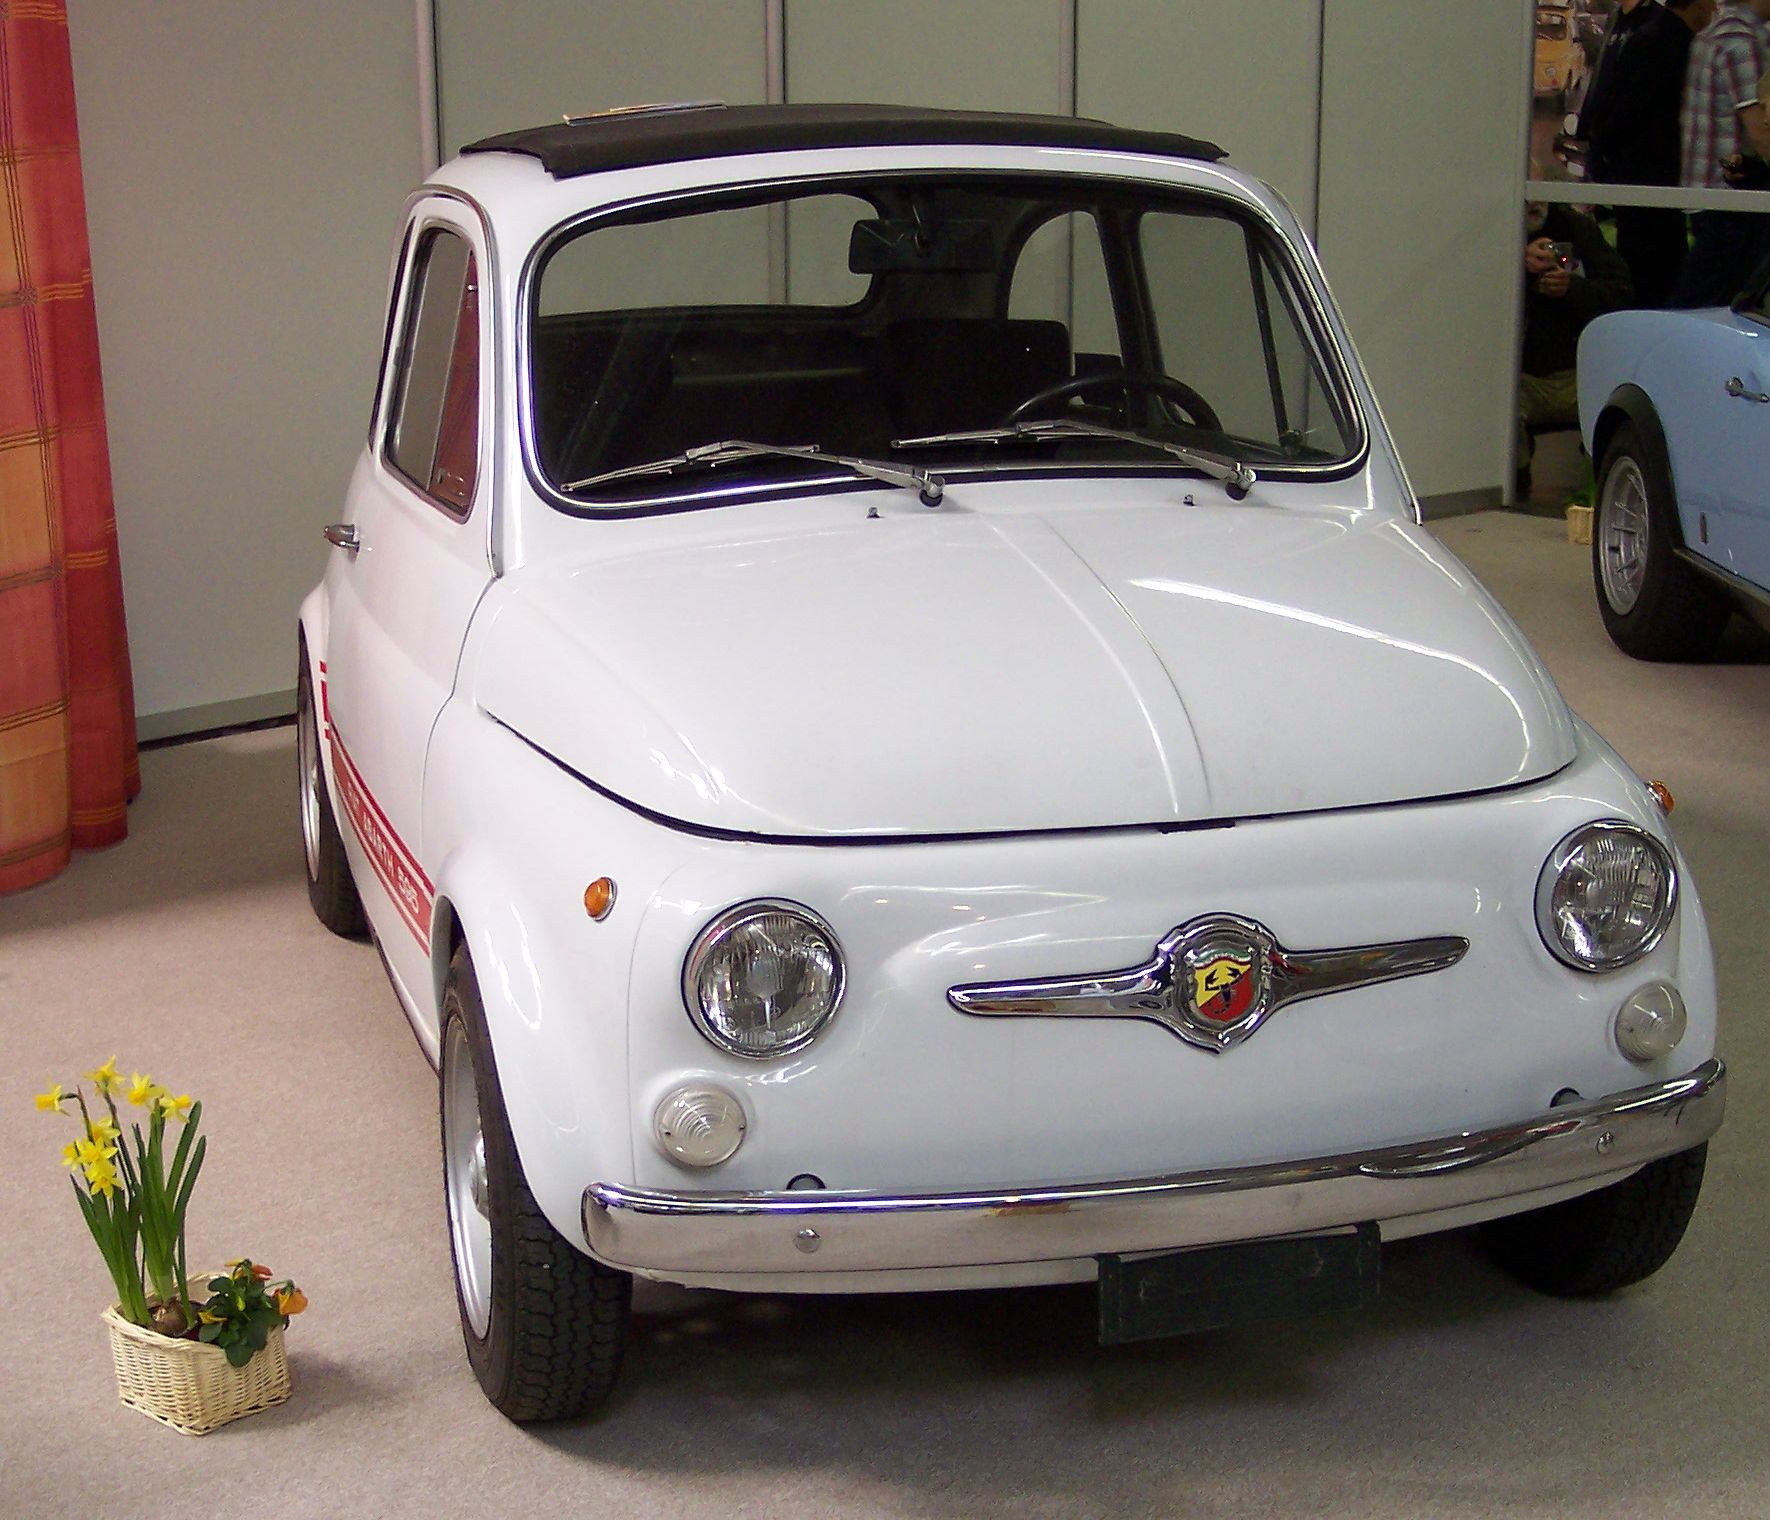 File Fiat 500 Abarth White V Tce Jpg Wikimedia Commons